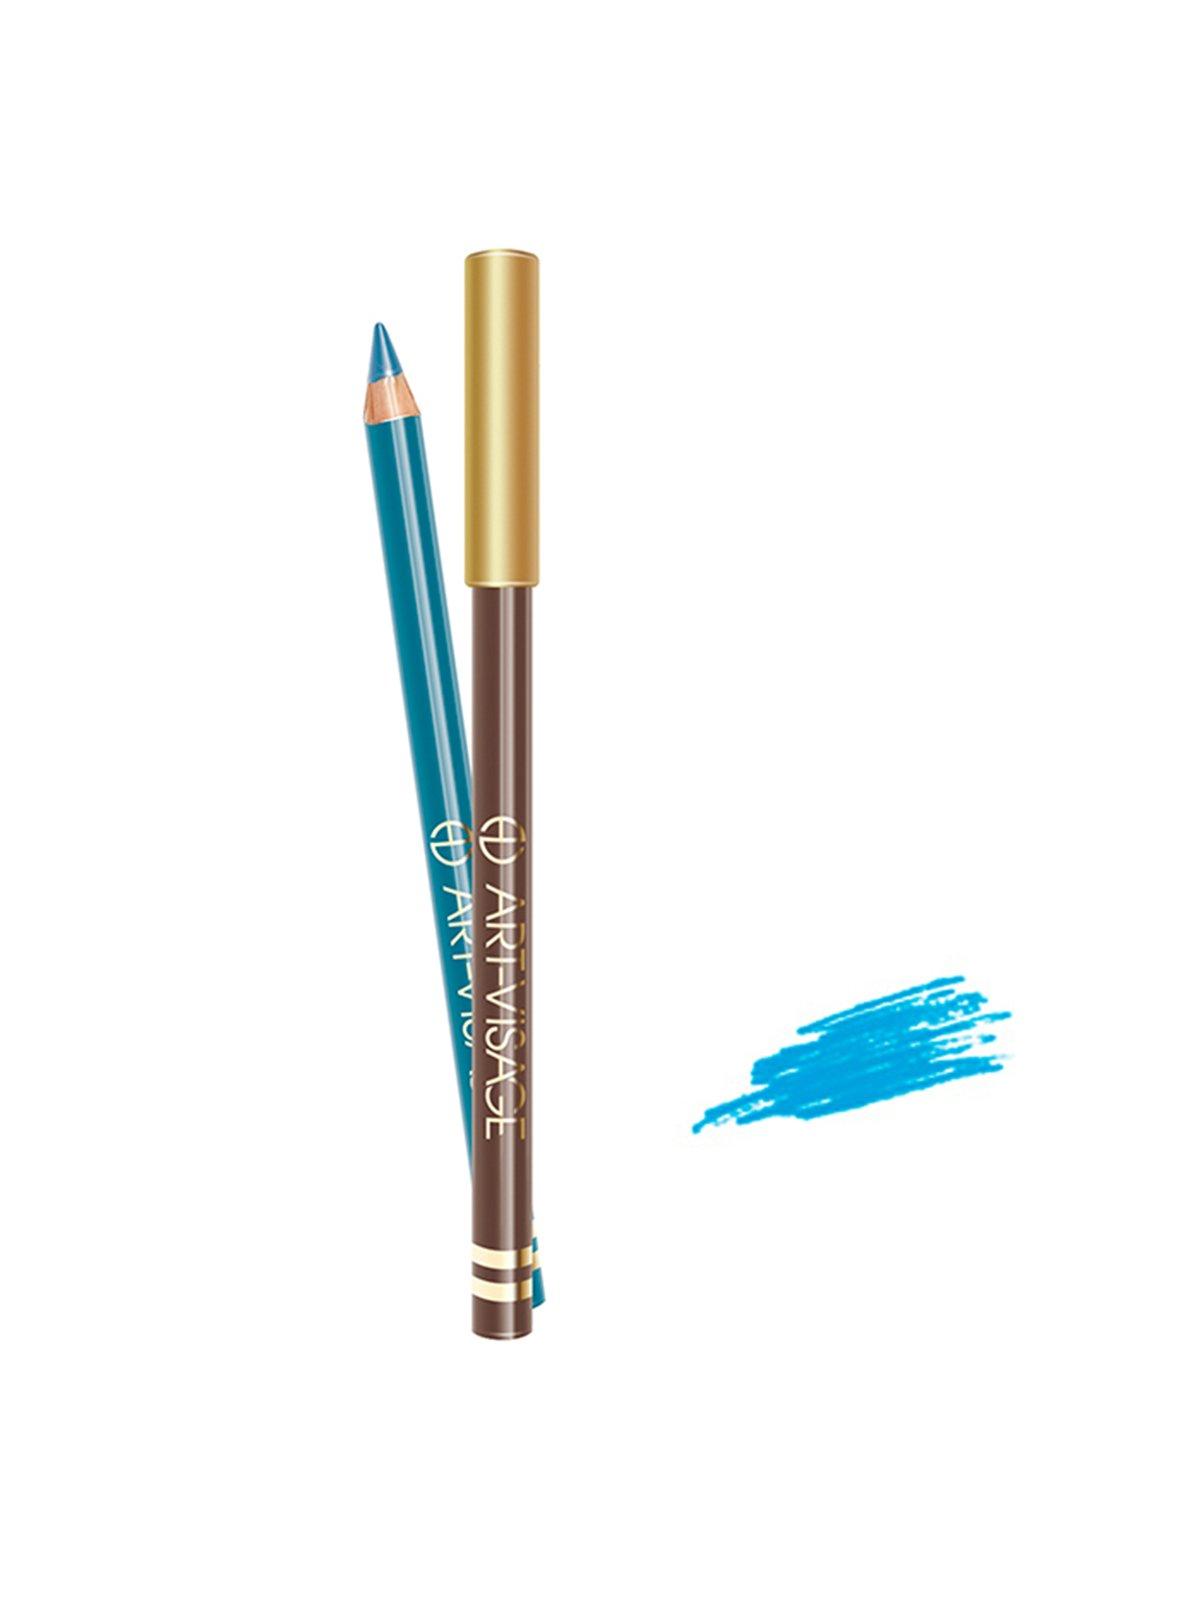 Олівець для очей - №138 - темна бірюза перламутр (5 г) | 4064350